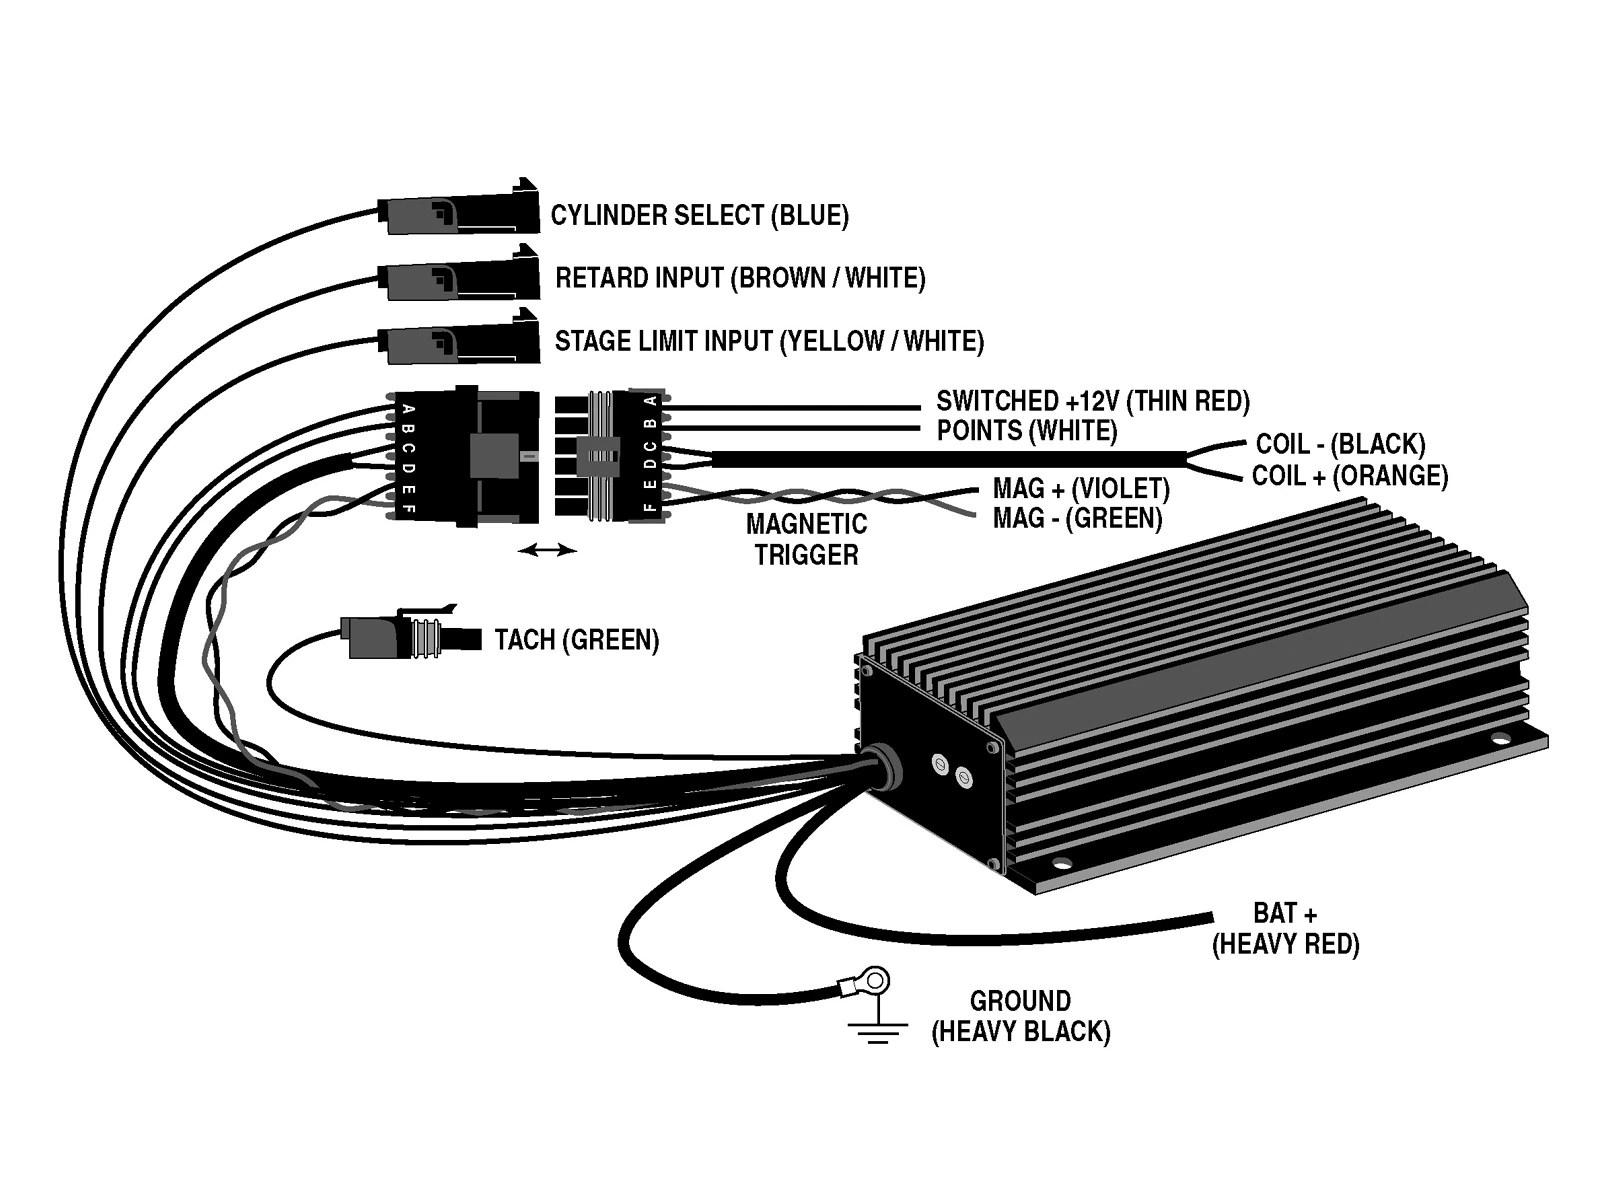 crane hi 6r capacitive discharge ignition 5 0 mustang super fords crane hi 6 wiring diagram [ 1600 x 1200 Pixel ]